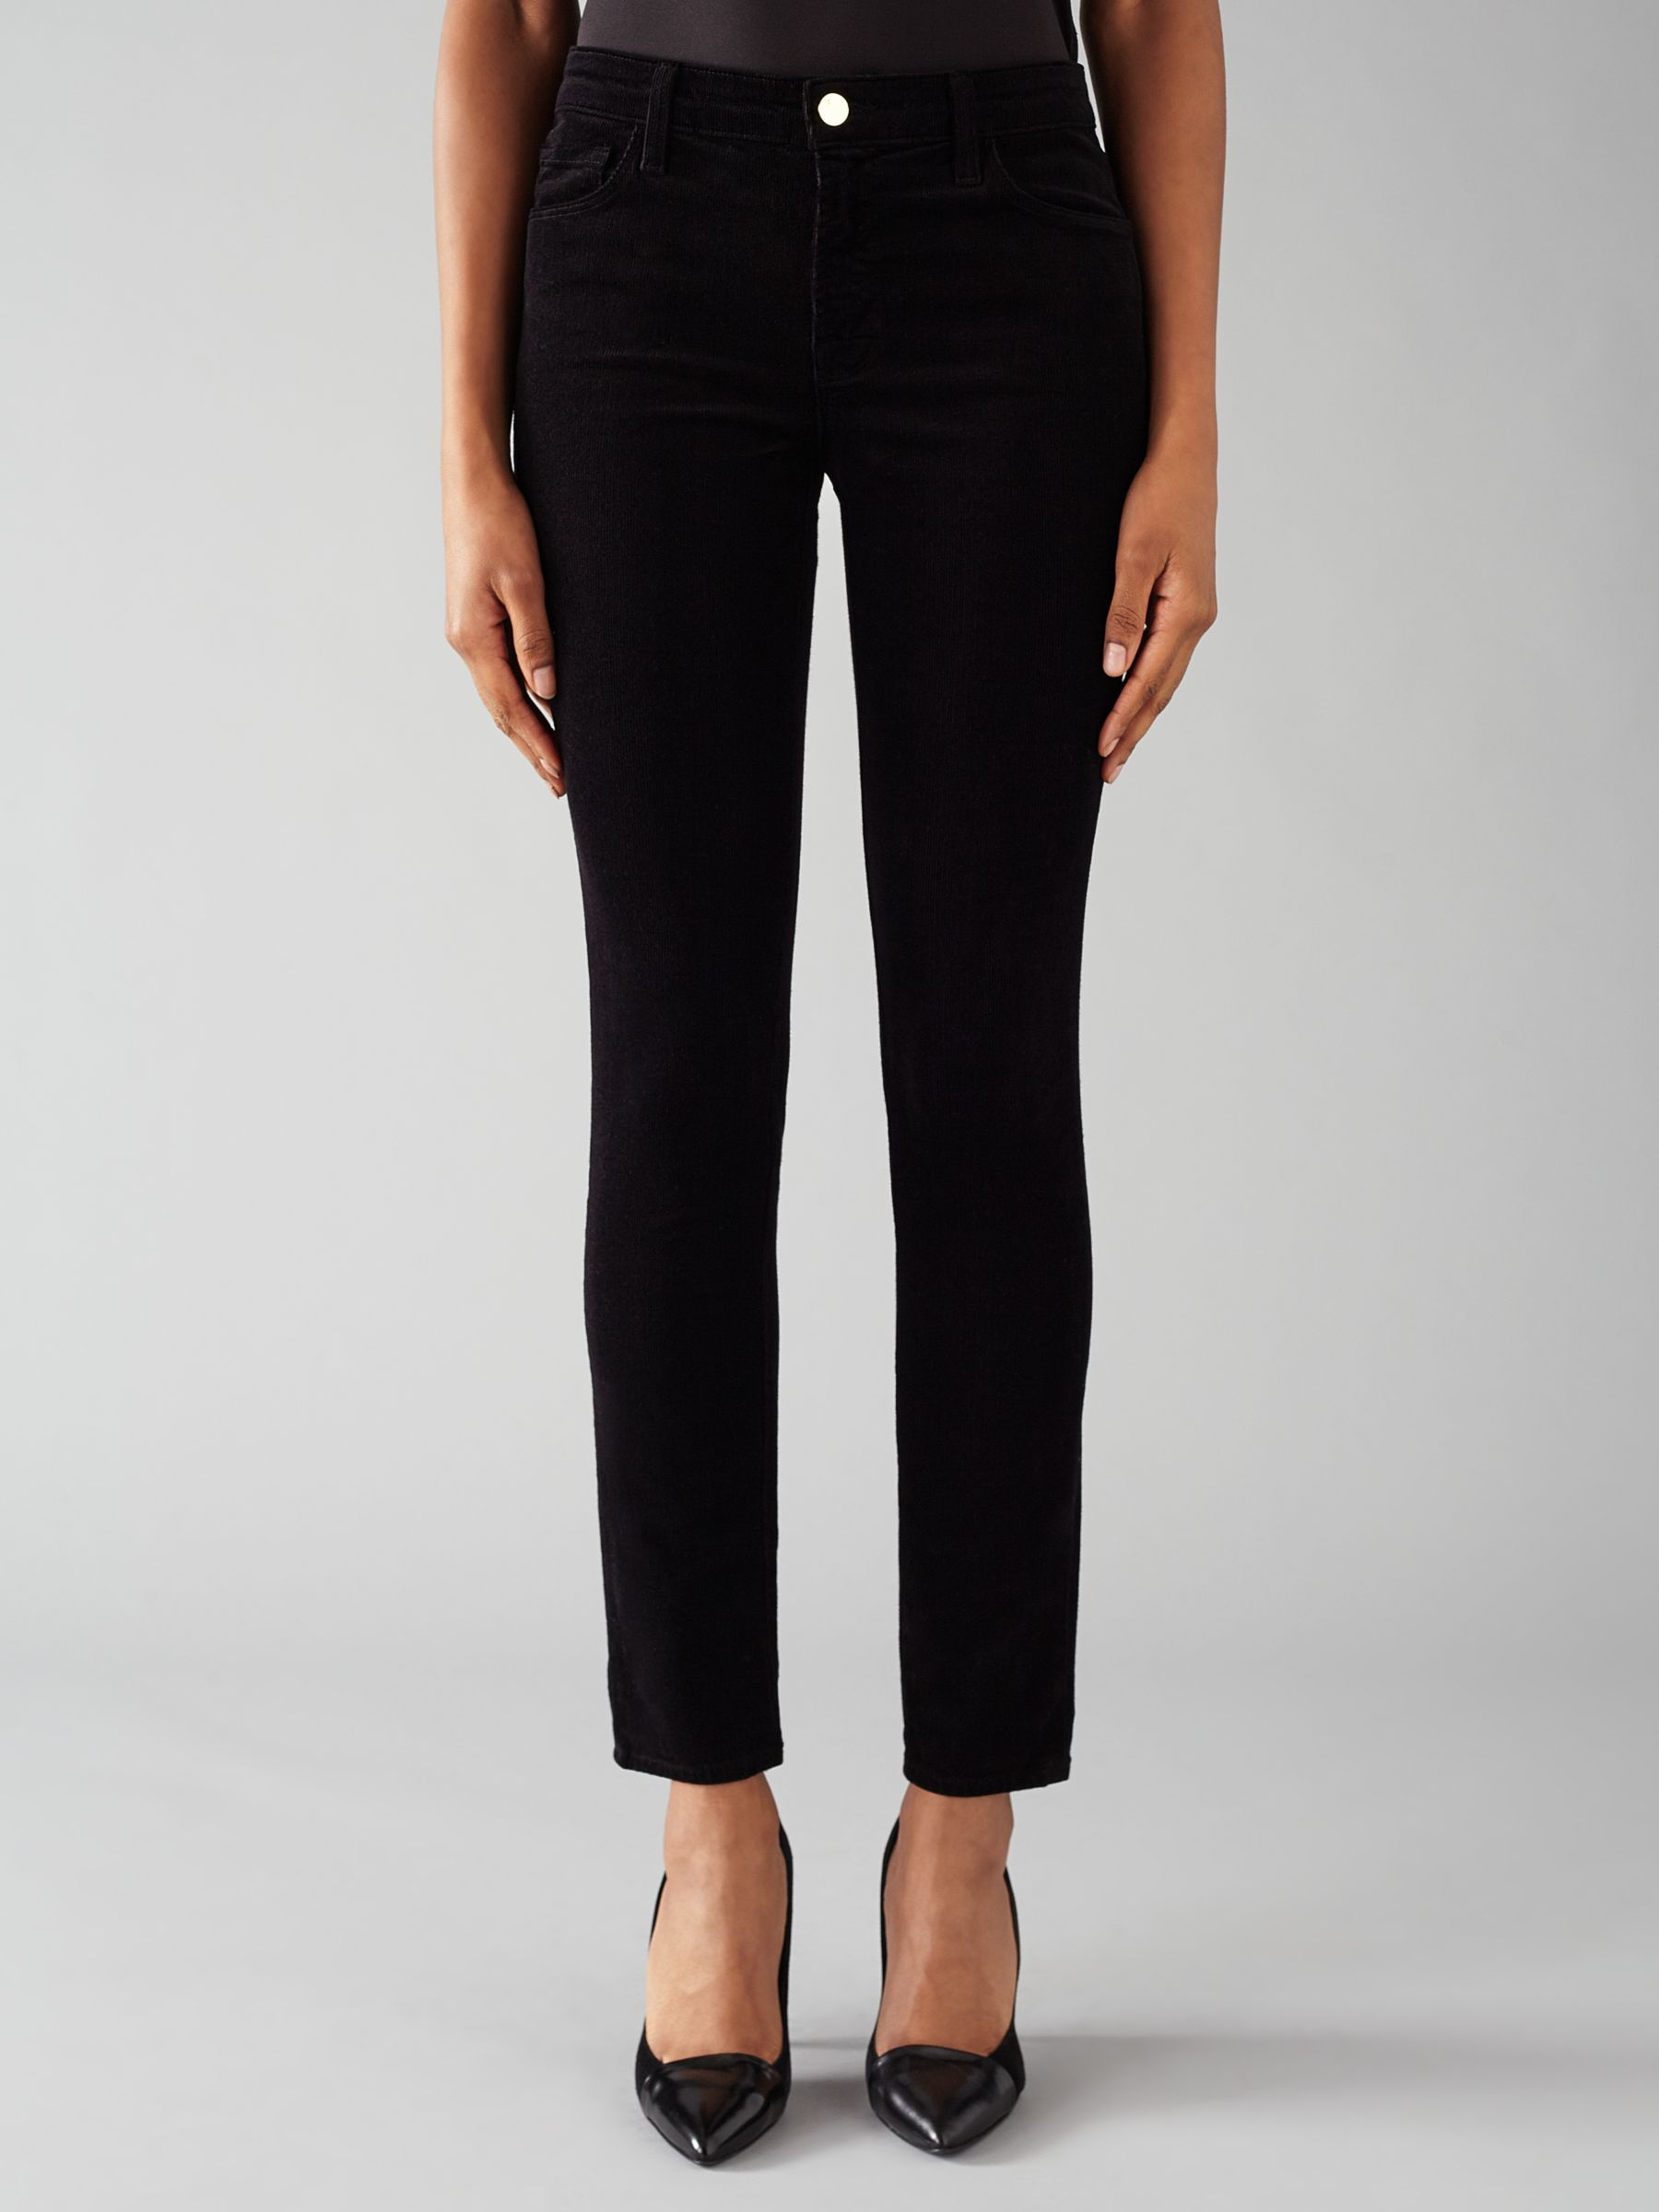 J Brand J Brand 811 Mid Rise Skinny Leg Corduroy Jeans, Black